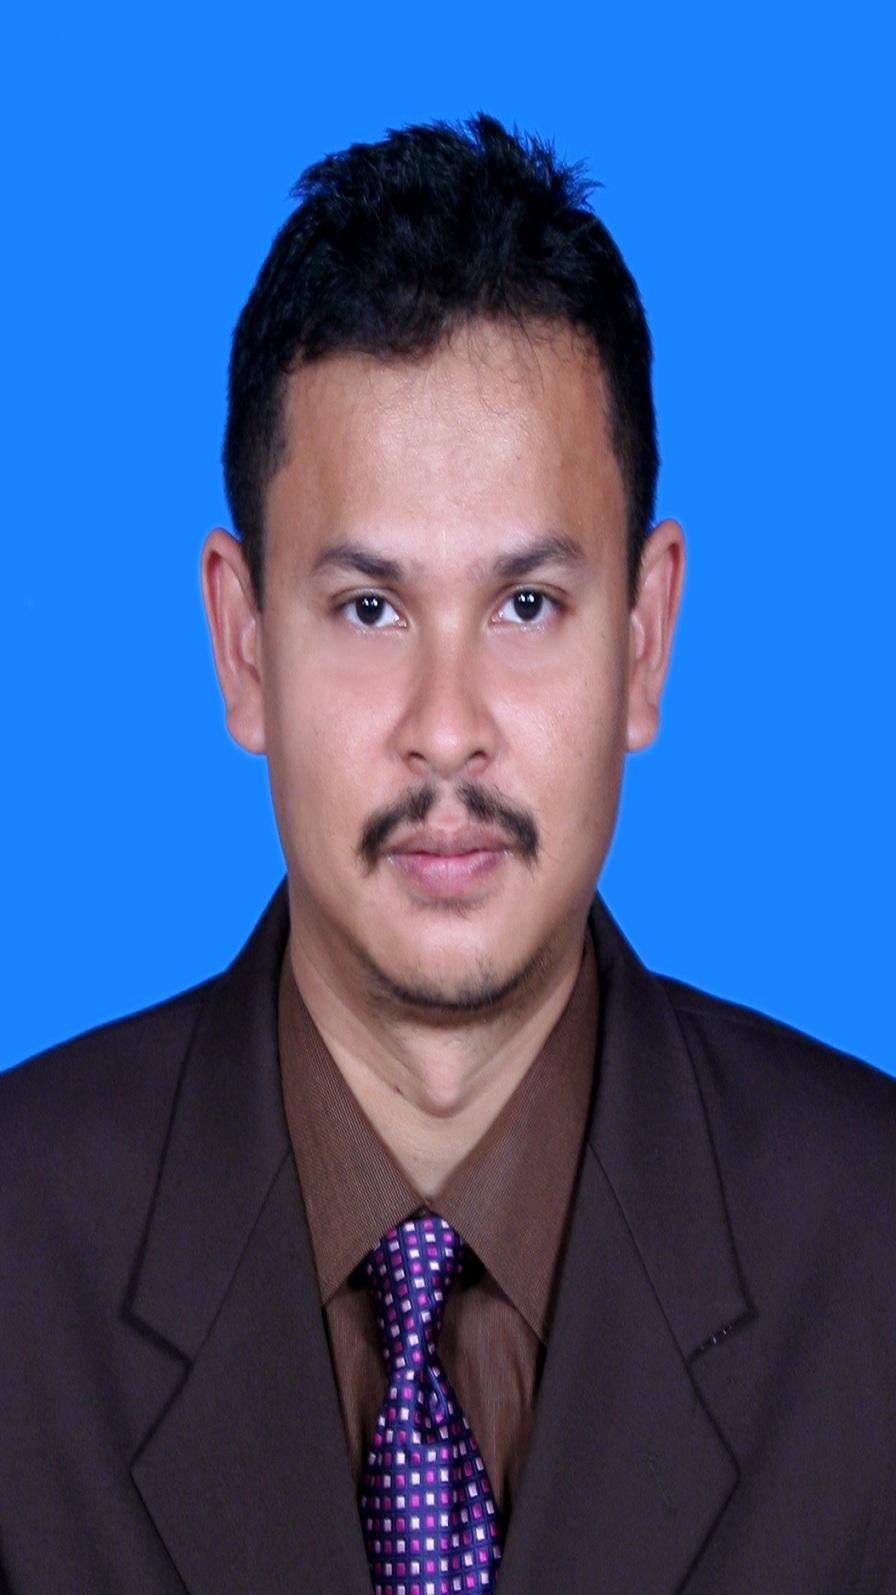 Mohammad Firuz Ramli